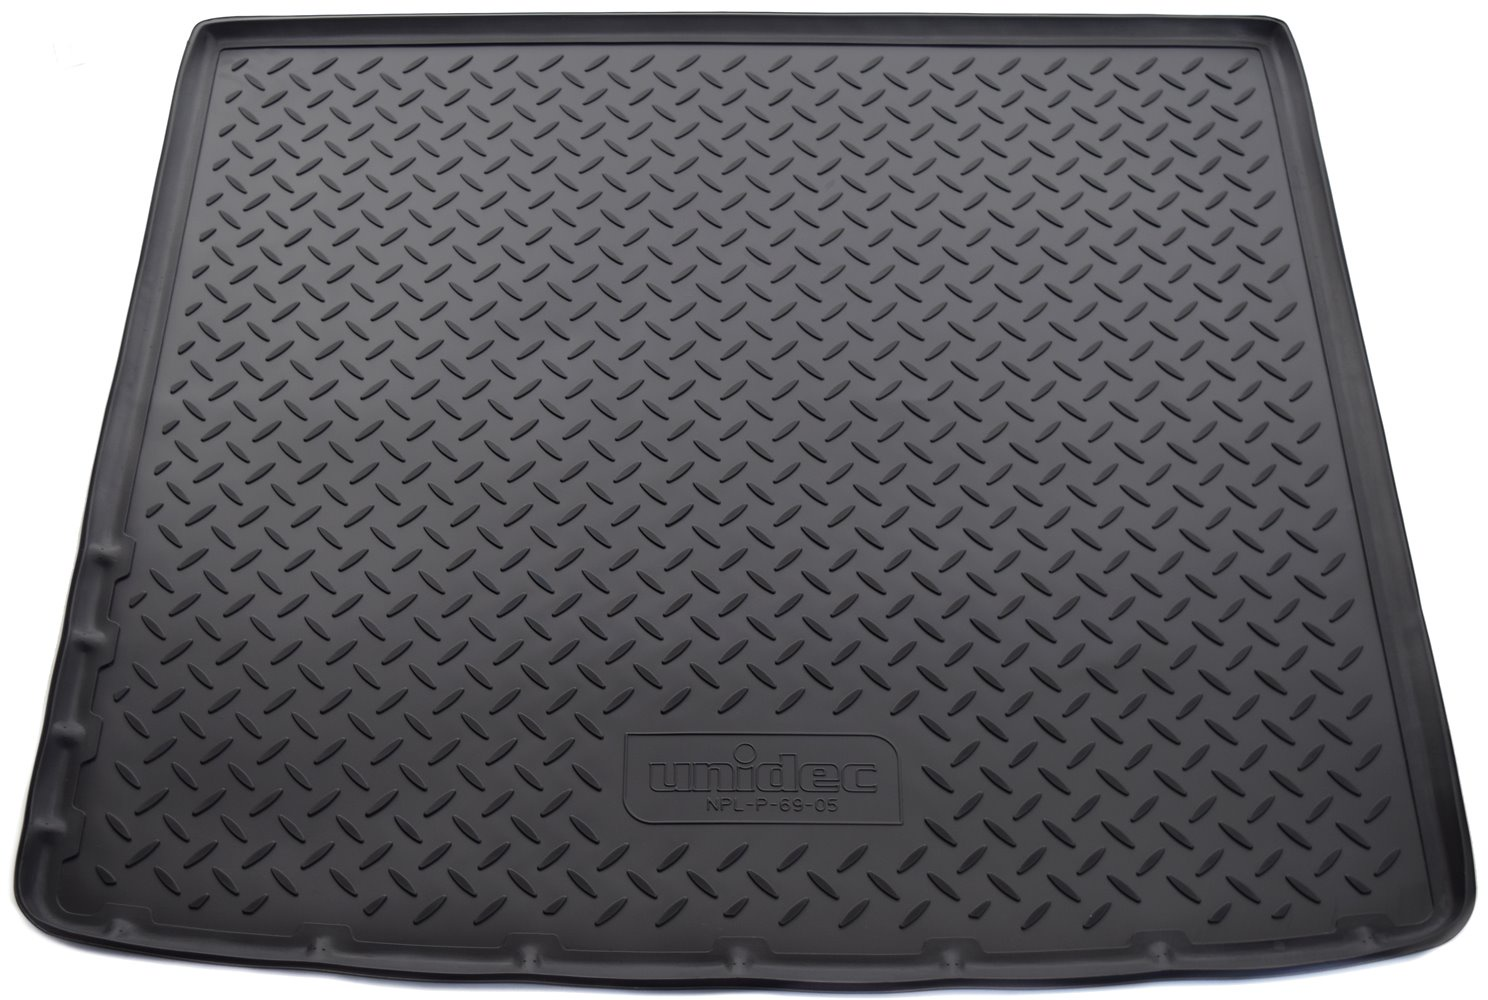 Коврик багажника для Nissan Terrano, 4WD, 2014, Renault Duster, 4WD, 2011, NPL-P-69-05, черный коврик багажника полиуретан чёрный 2awd norplast npl p 69 04 для renault duster 2011